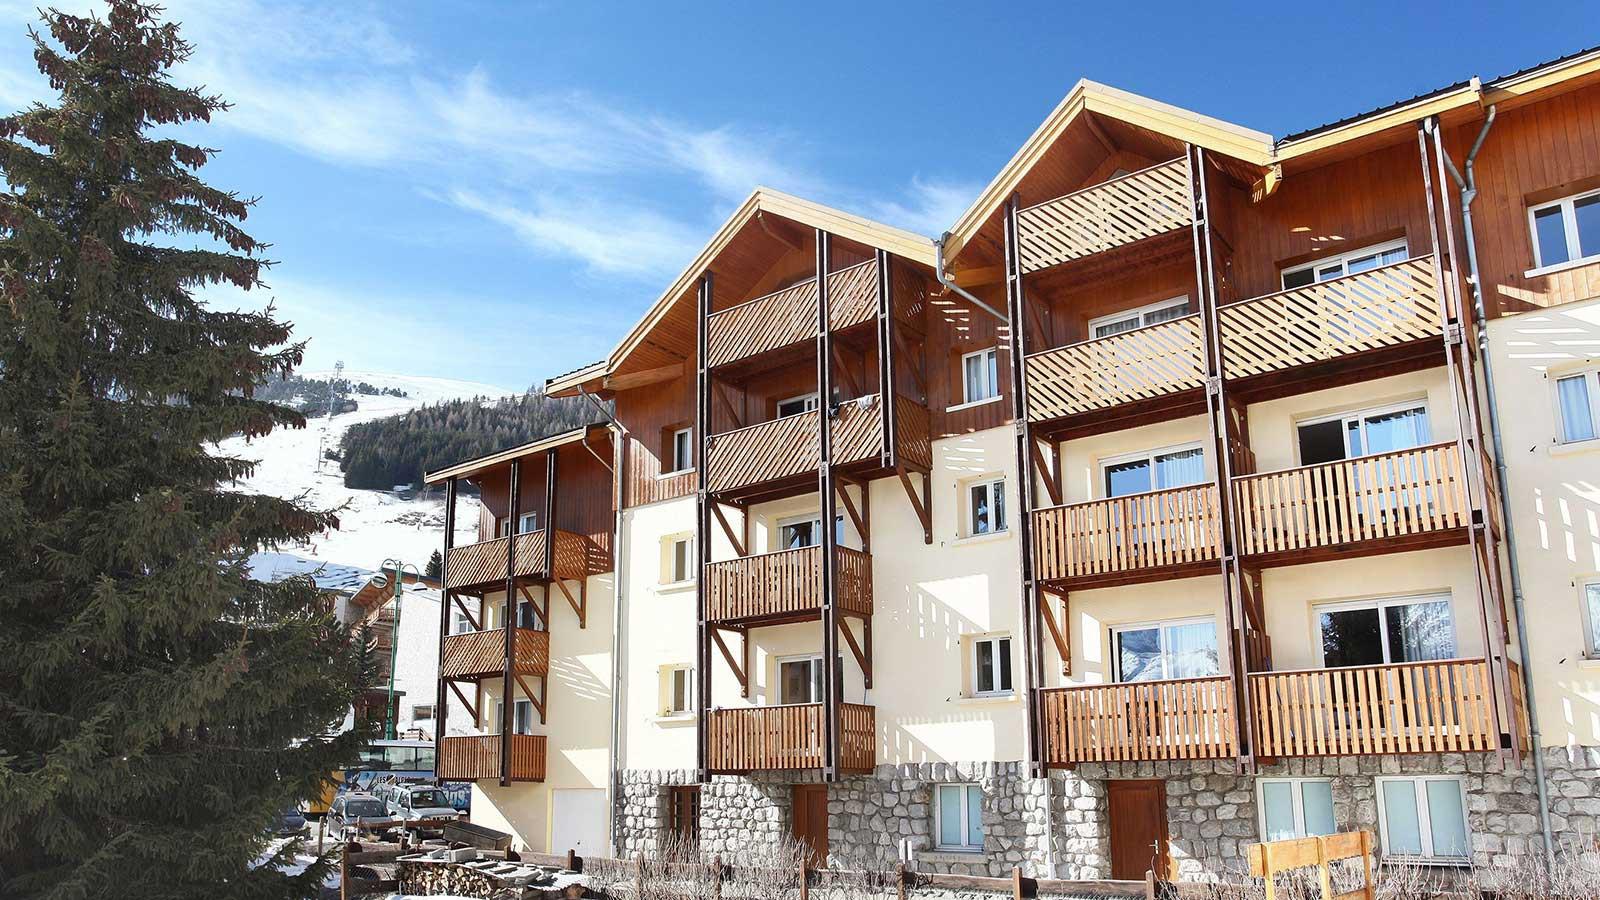 Residence Surf Des Neiges, Les Deux Alpes - Exterior